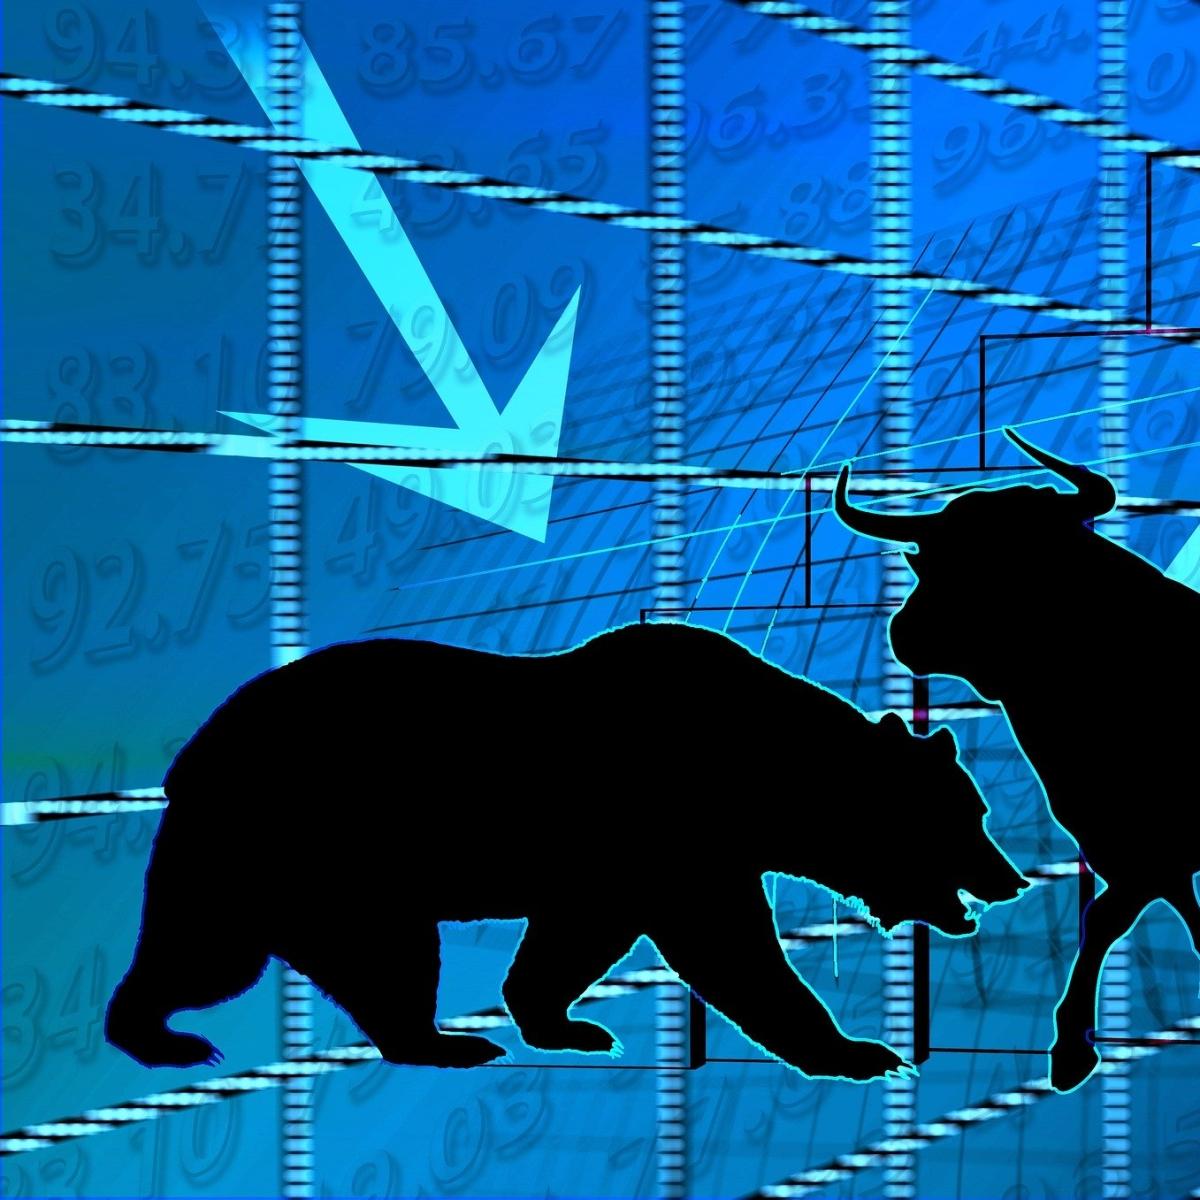 Market Update: Sensex rallies; ONGC, M&M, IndusInd Bank, HDFC Bank, SBI are among top gainers